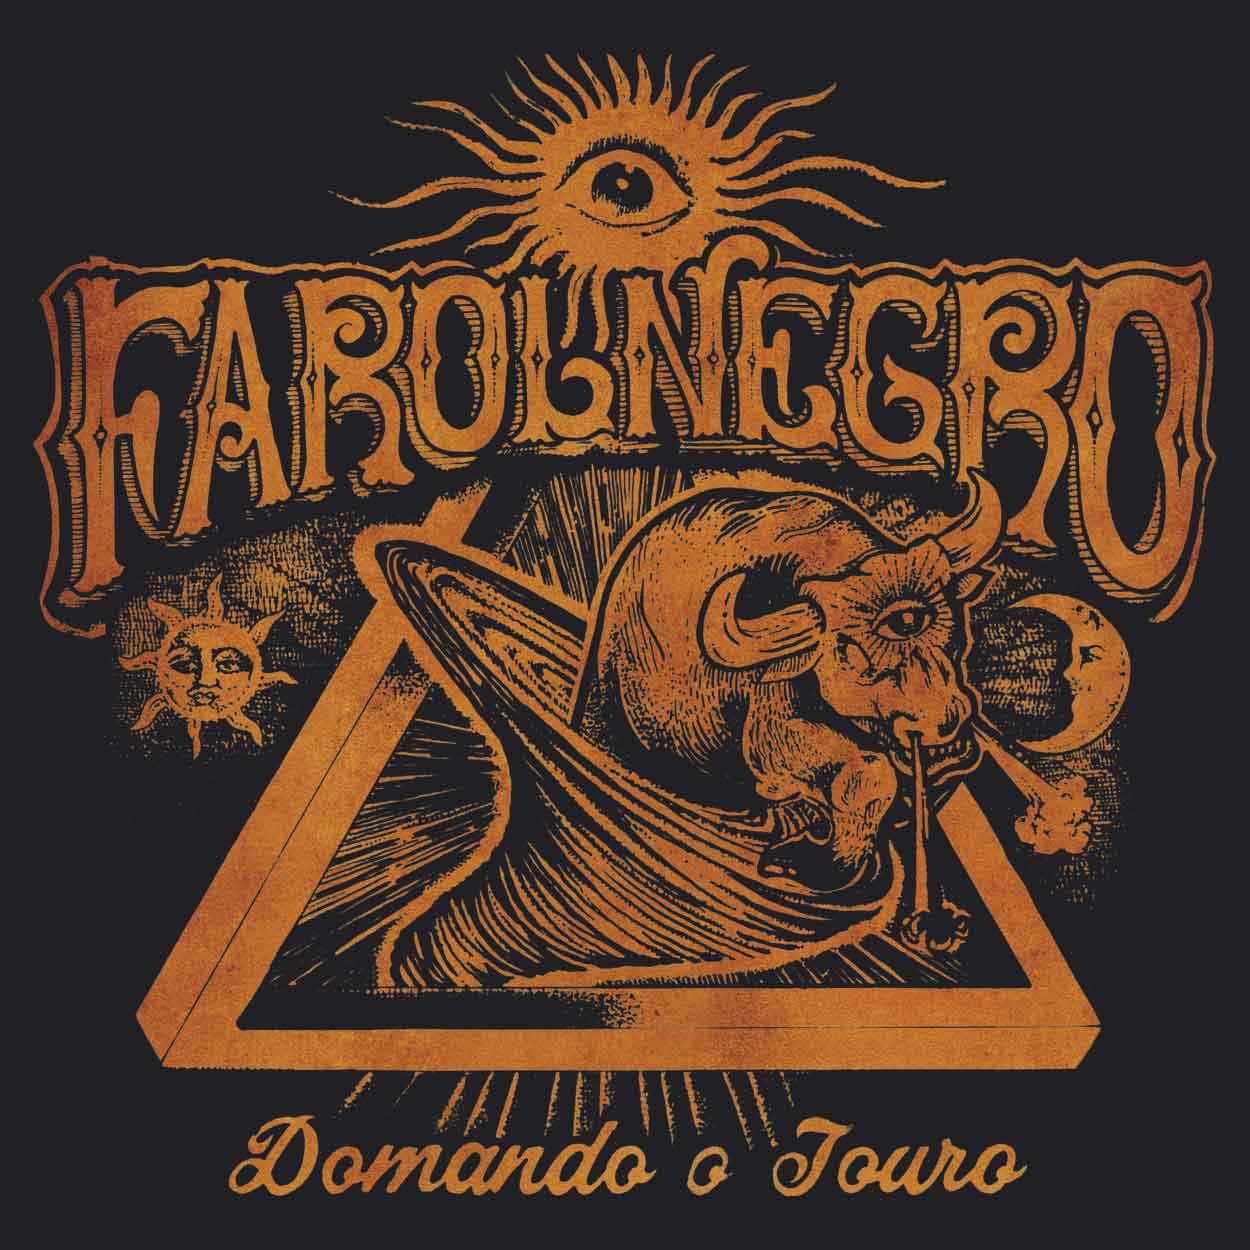 Camiseta - Domando o Touro - Farol Negro -  Feminino